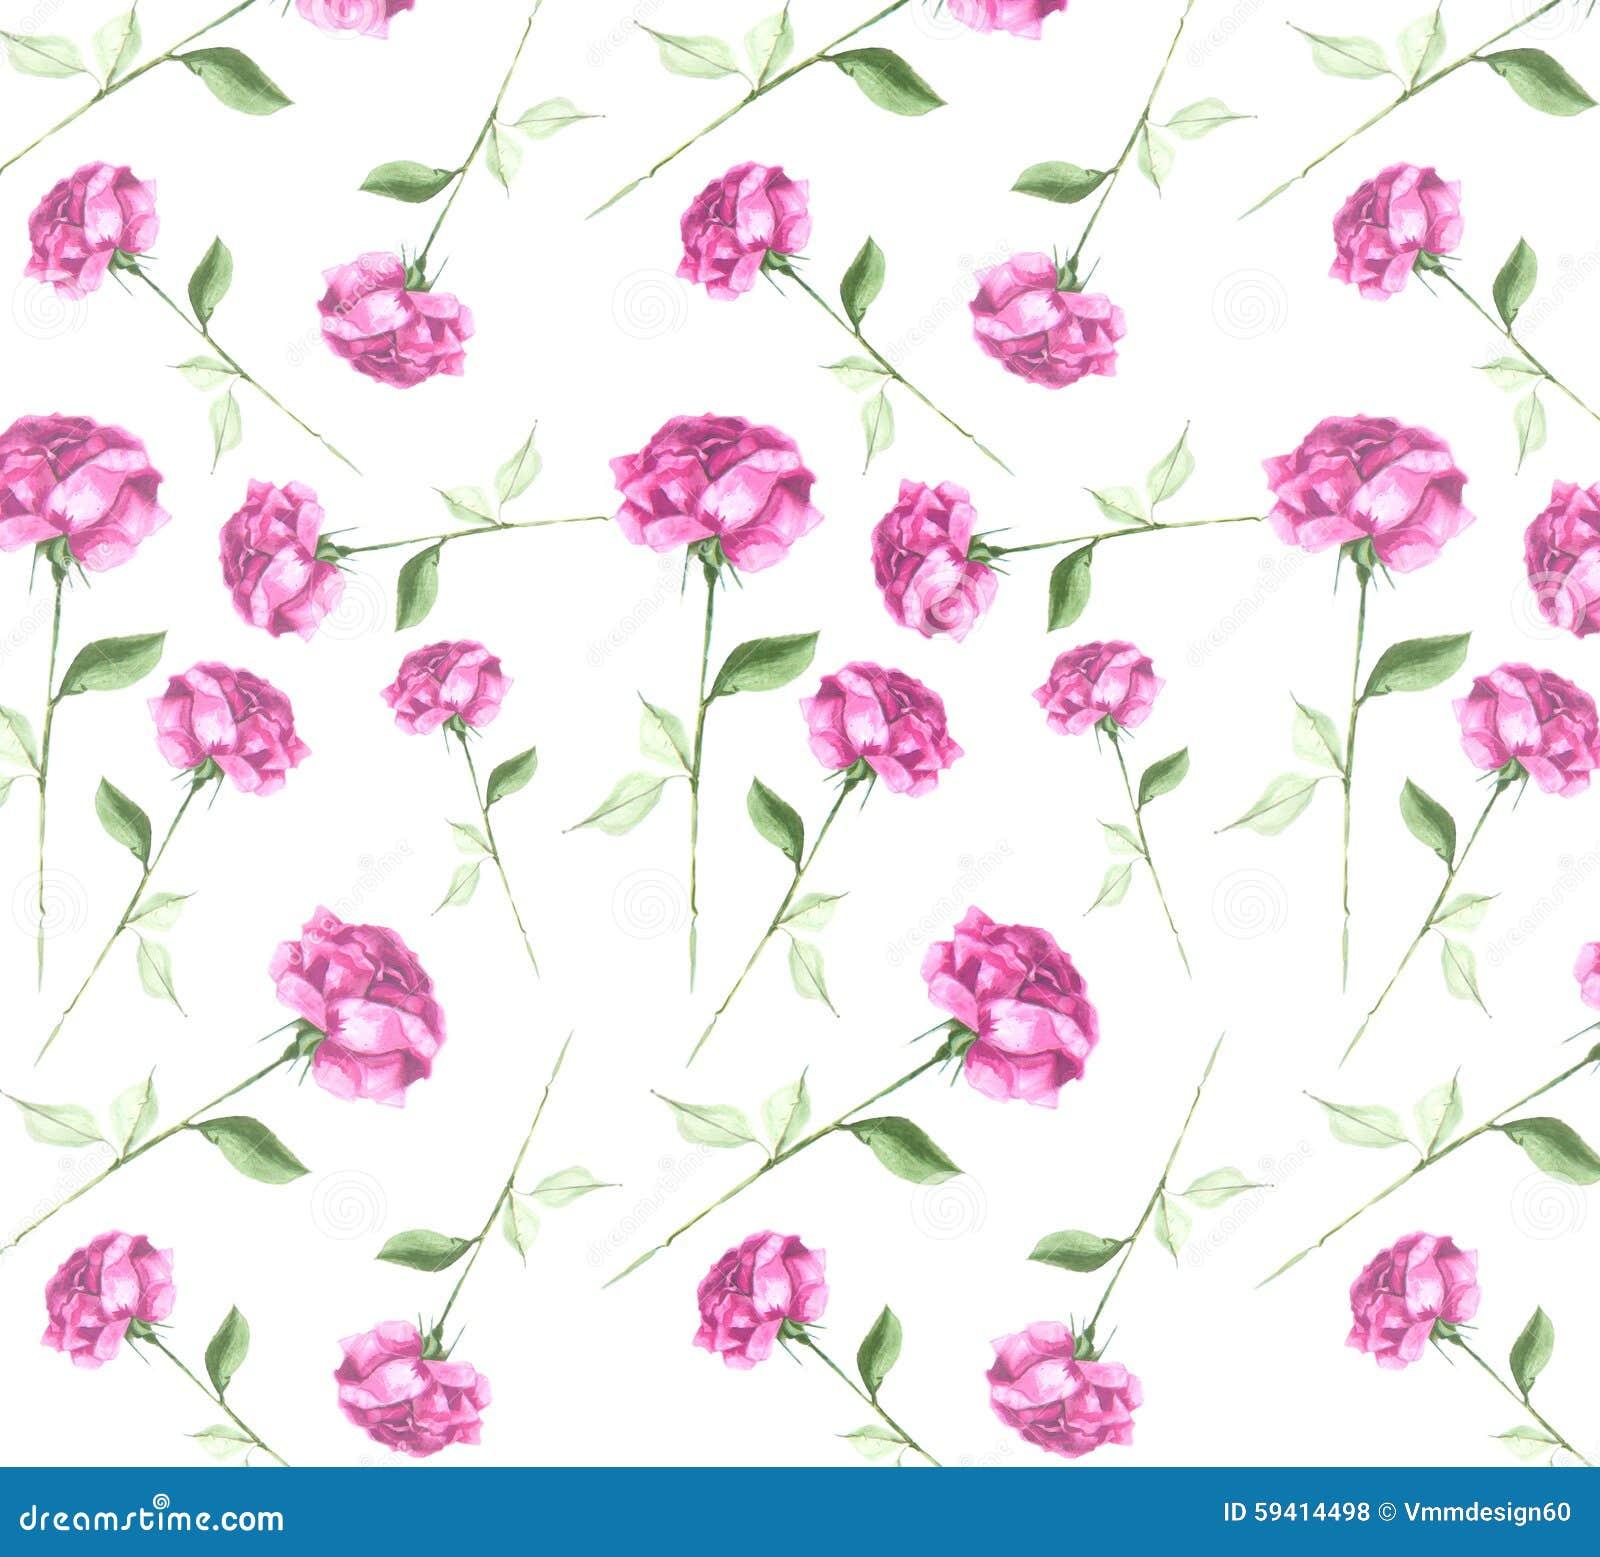 Elegant Fresh Watercolor Abstract Rose Flower Art Seamless Wallpaper